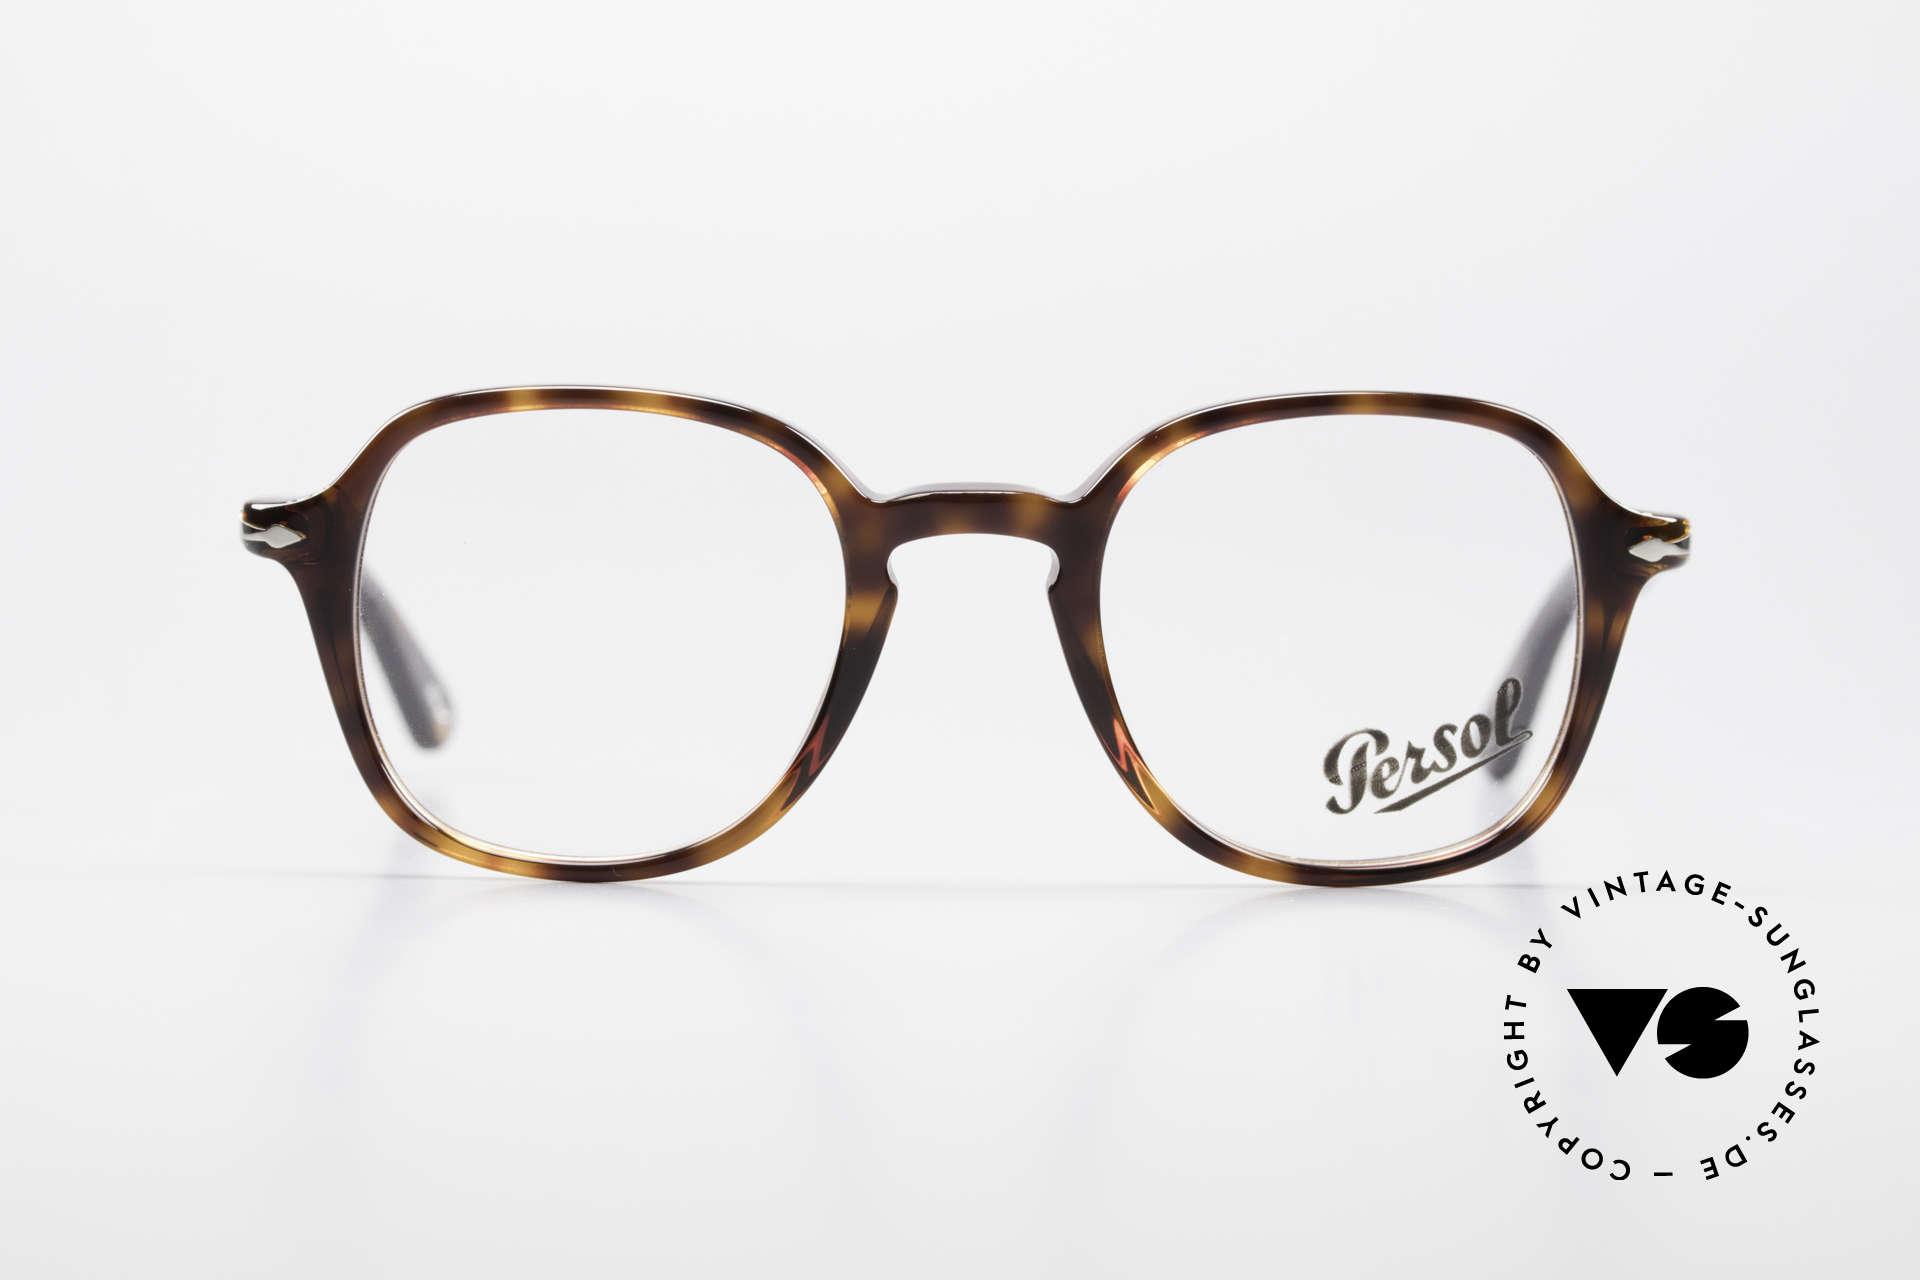 Persol 3142 Square Panto Eyeglasses Unisex, original name: 3142-V, col. 24, size 45-21, 145, Made for Men and Women